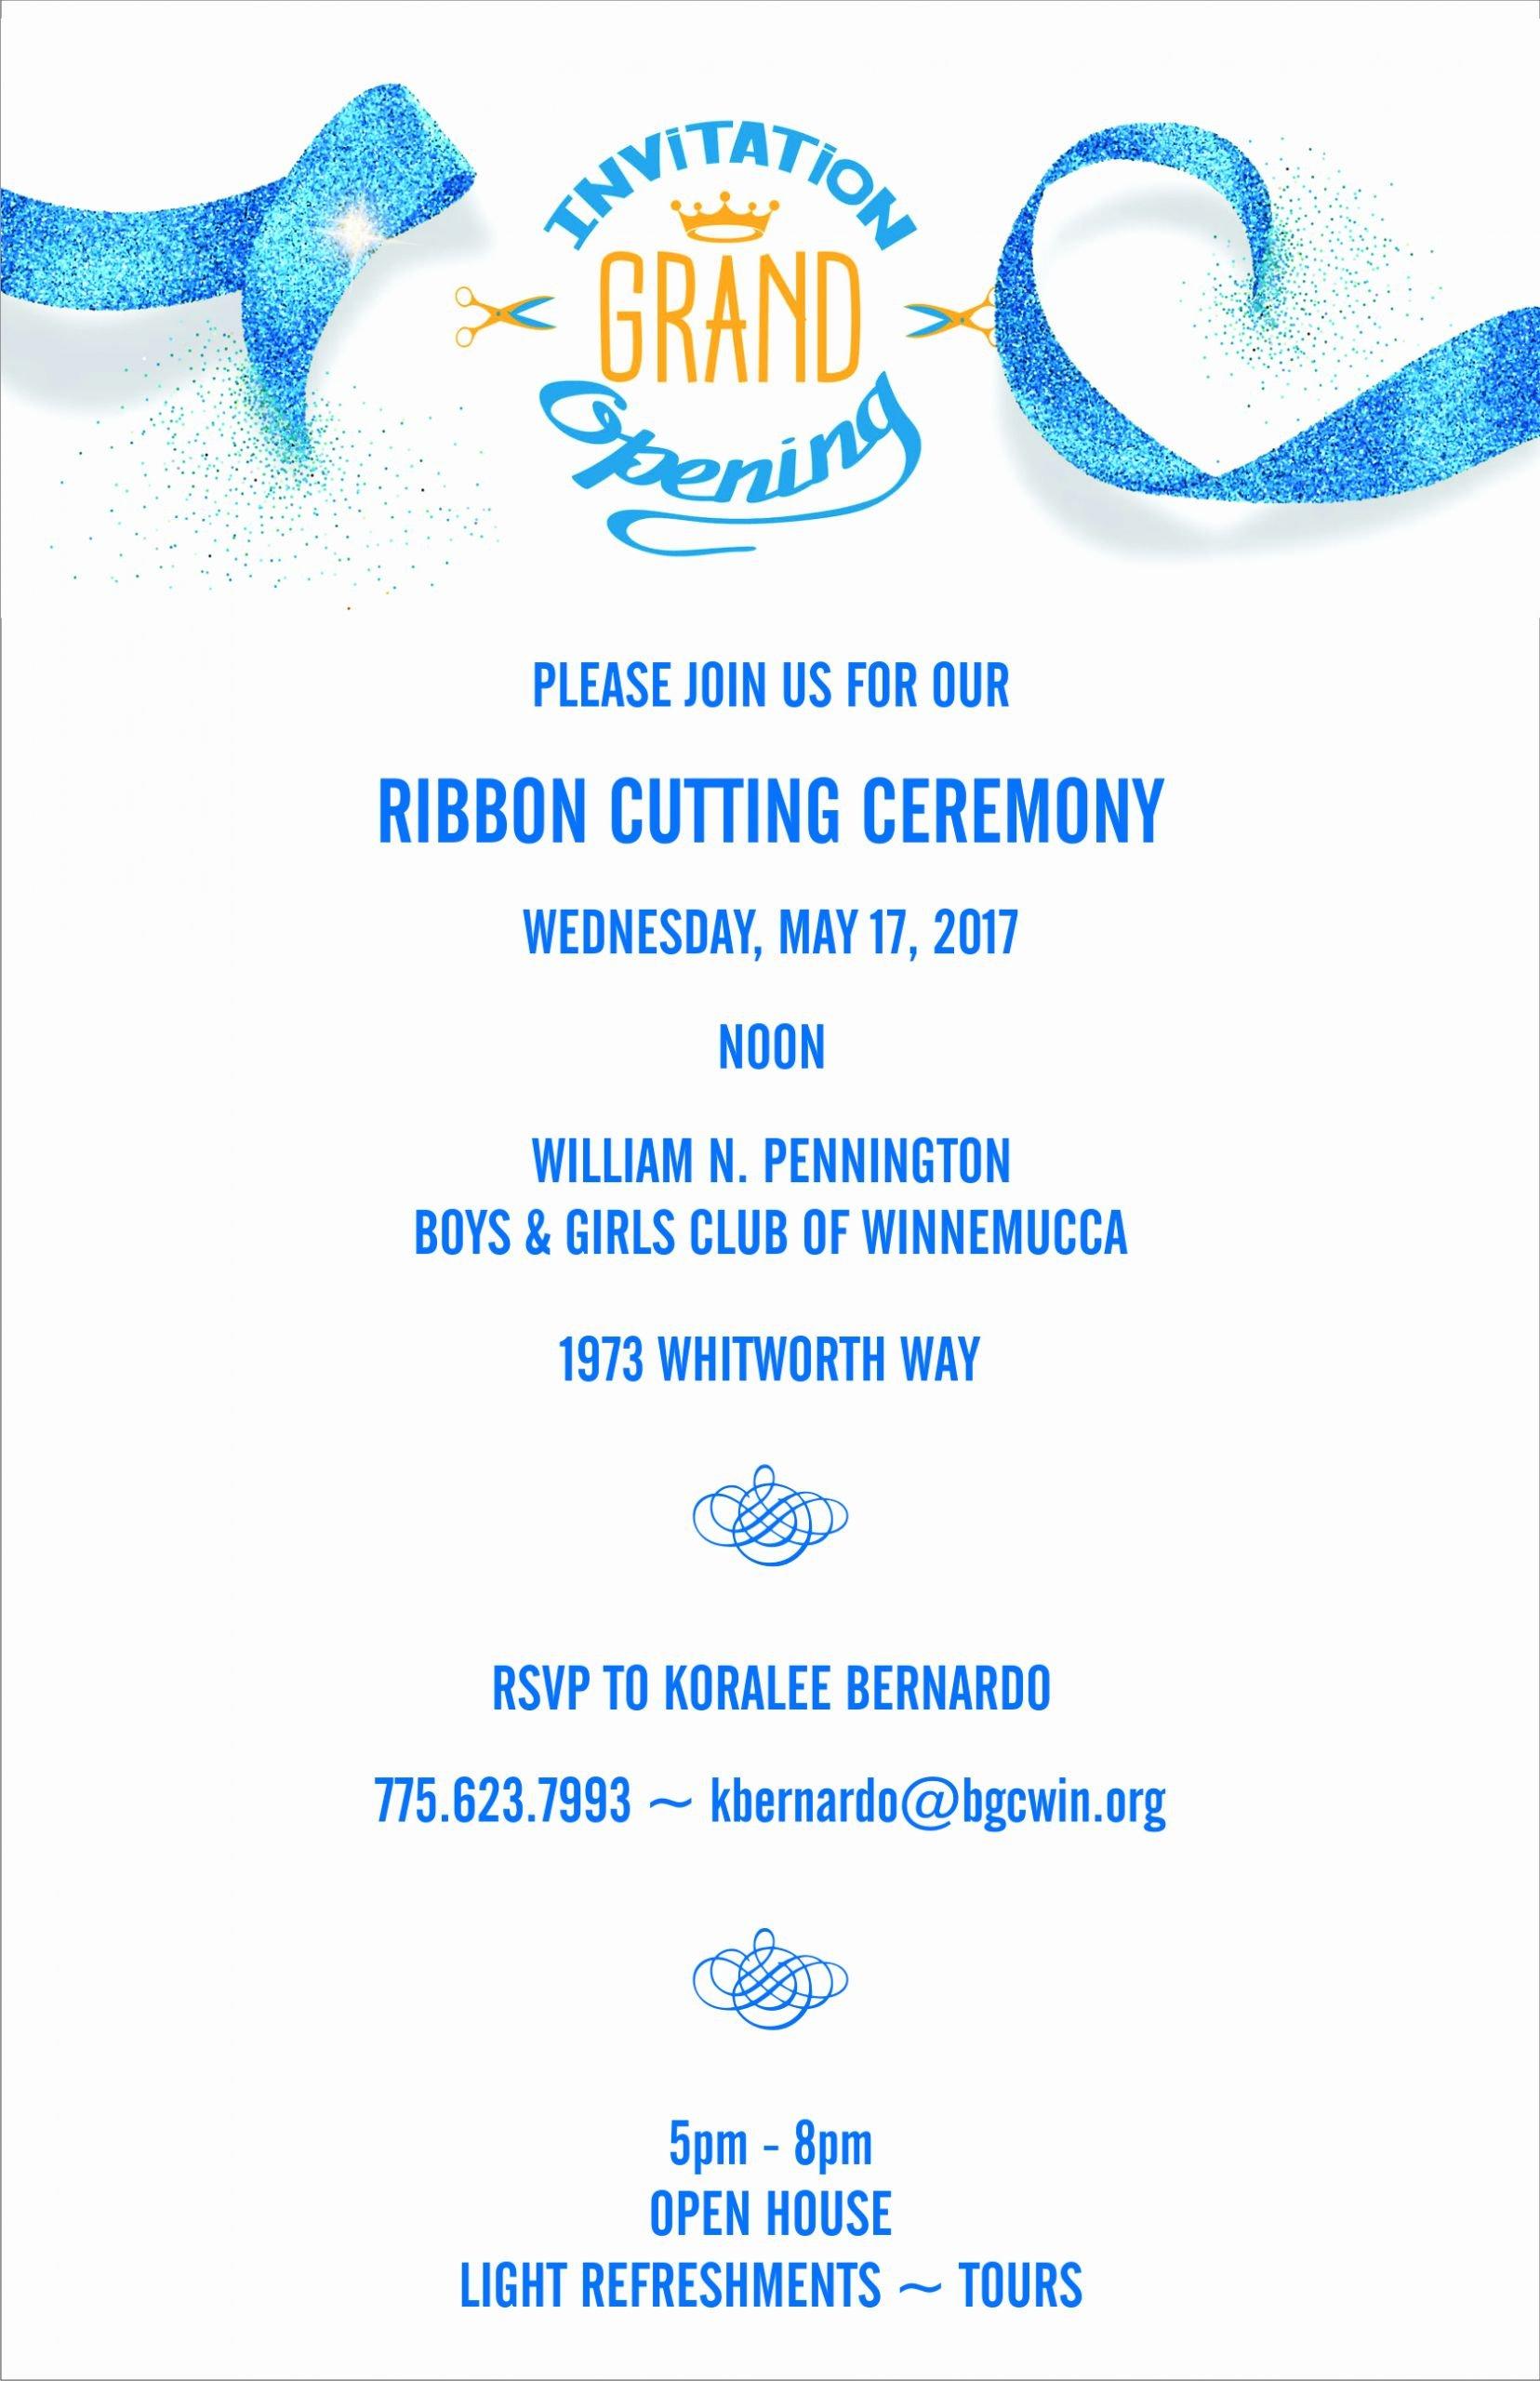 Ribbon Cutting Ceremony Invitation Template Awesome Ribbon Cutting Ceremony – Boys & Girls Club Winnemucca